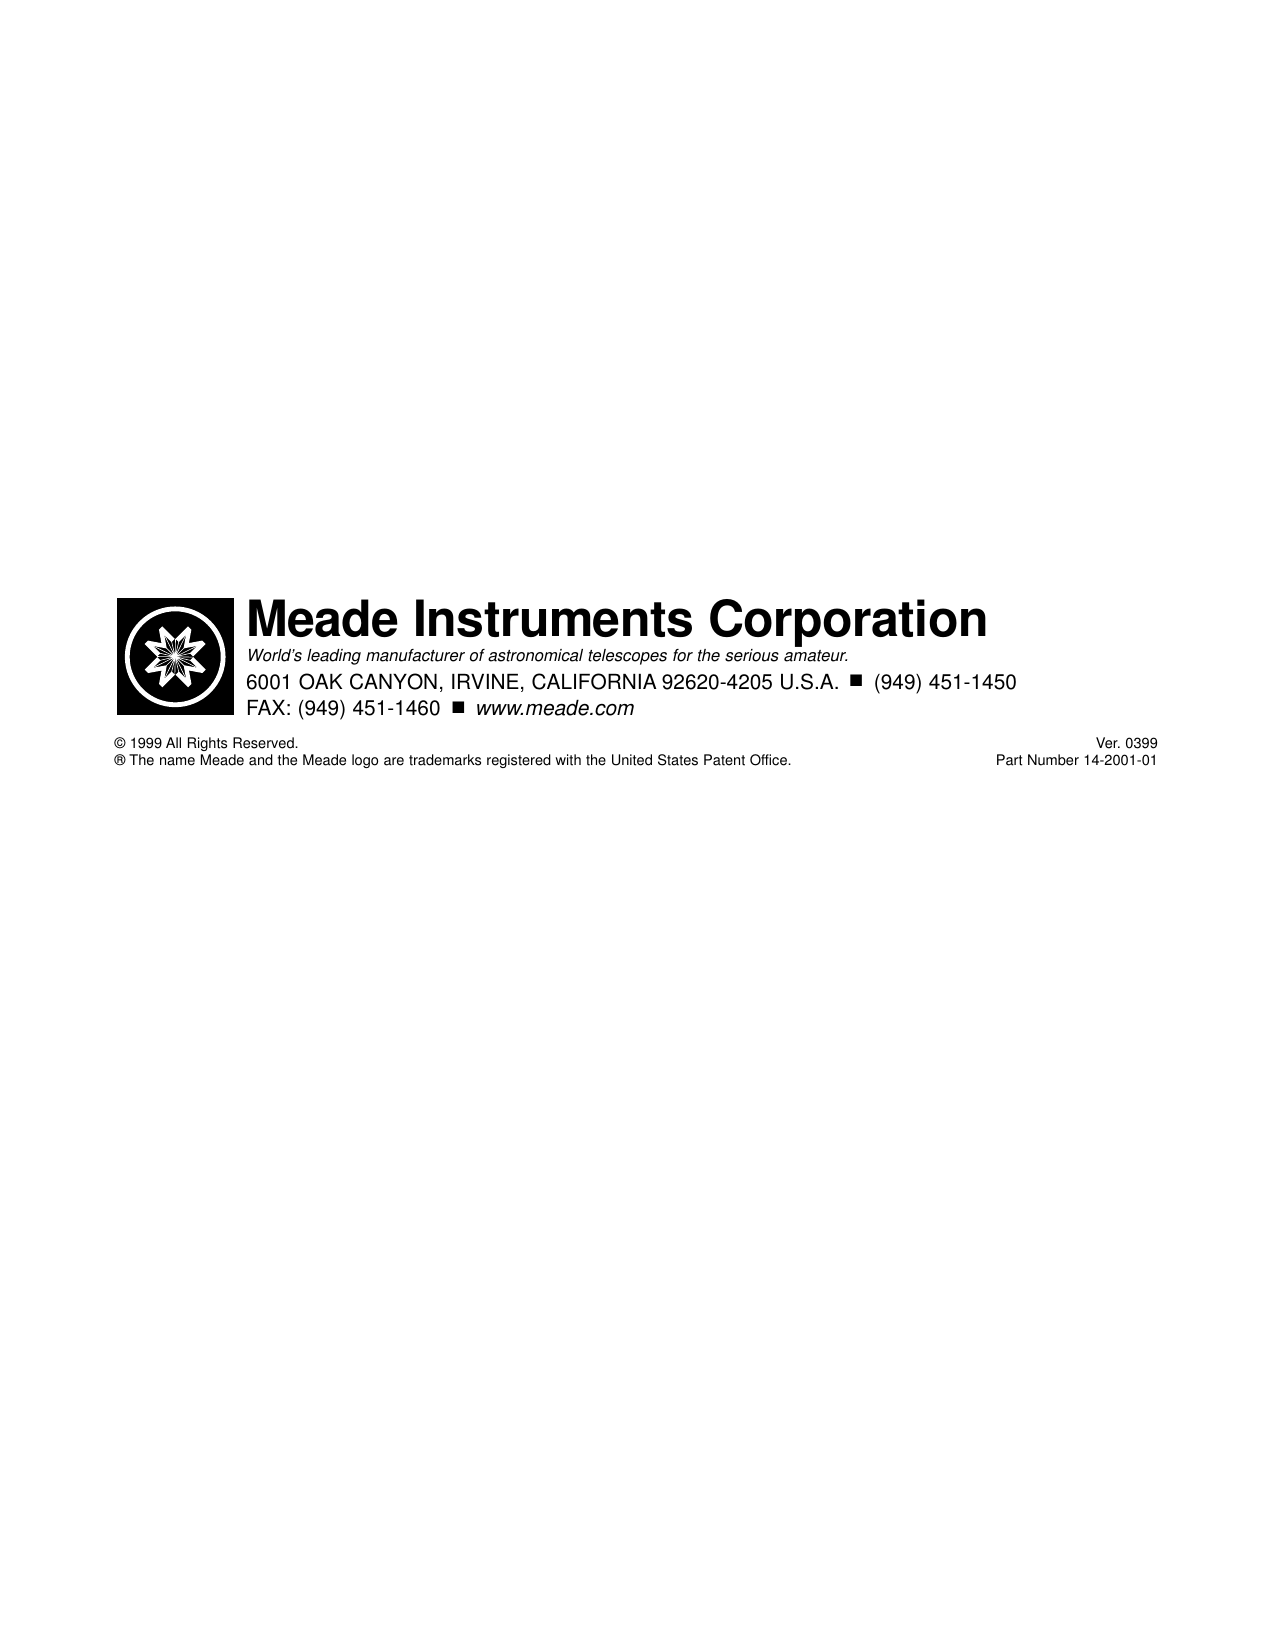 Page 12 of 12 - Meade Meade-497-Autostar-Computer-Controller-Instruction-Manual-  Meade-497-autostar-computer-controller-instruction-manual